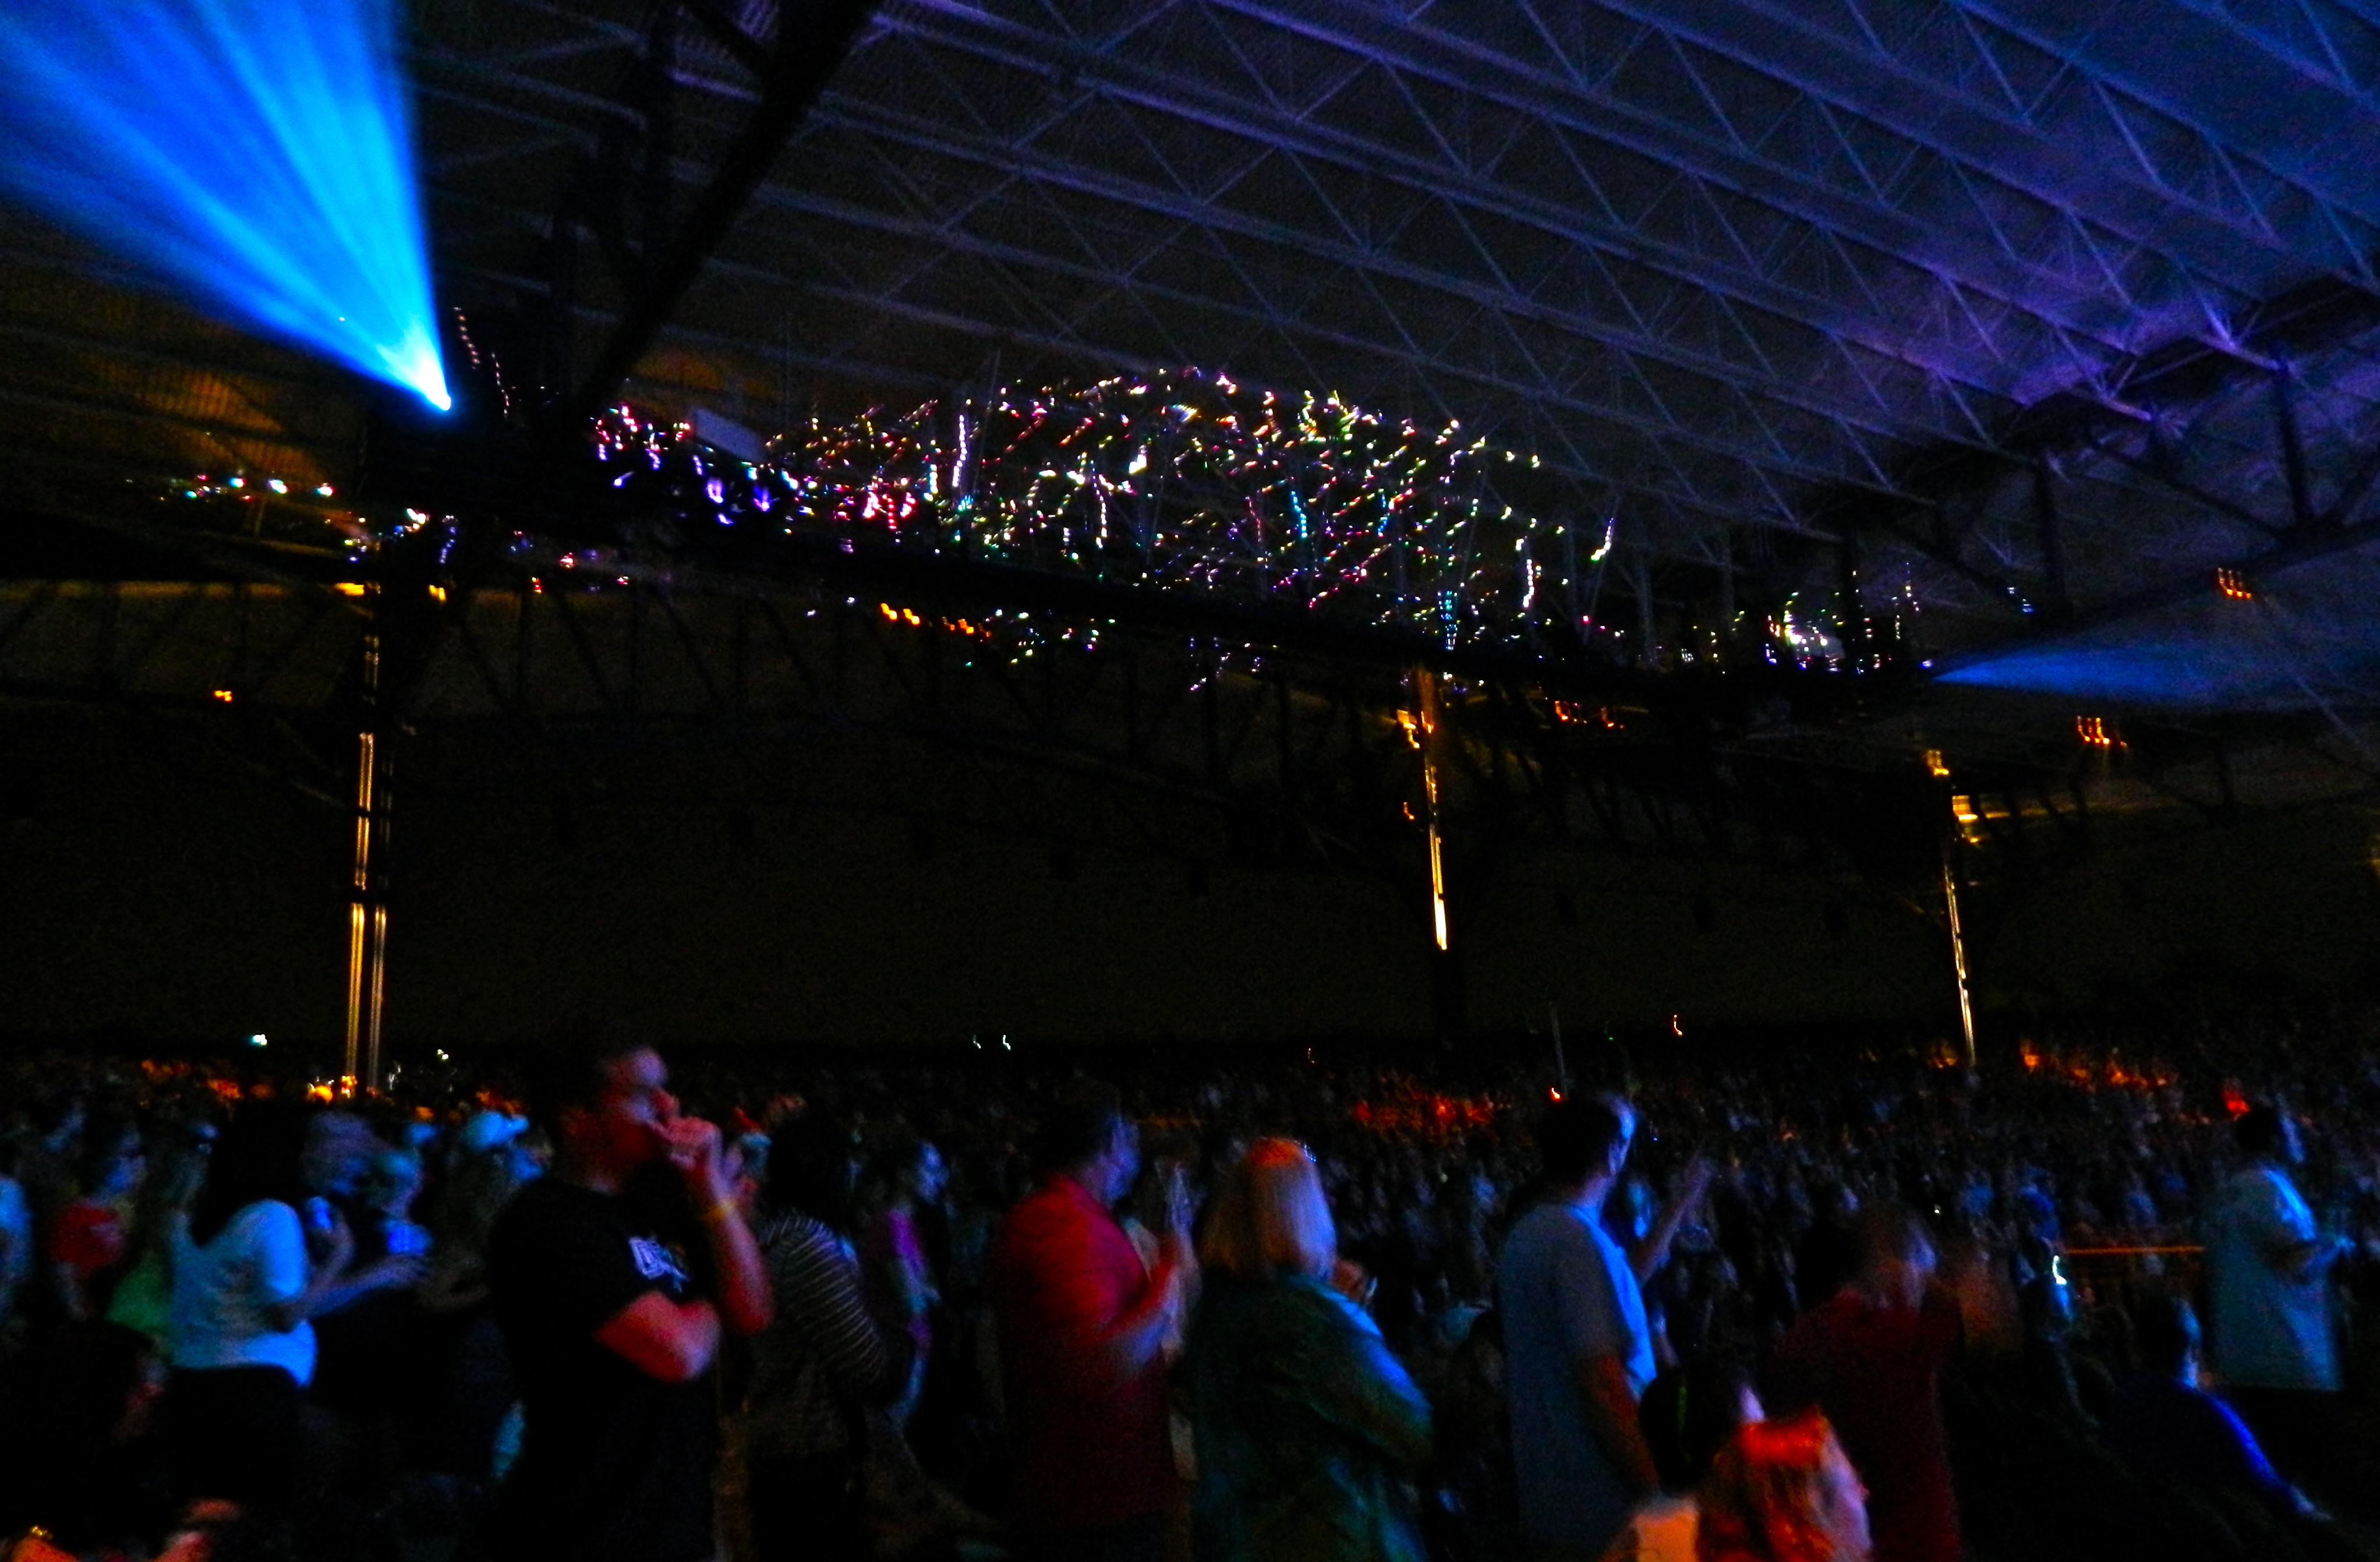 Jiffy Lube Hours Sunday >> Jiffy Lube at Jiffy Lube Live | 2012 Concert Season